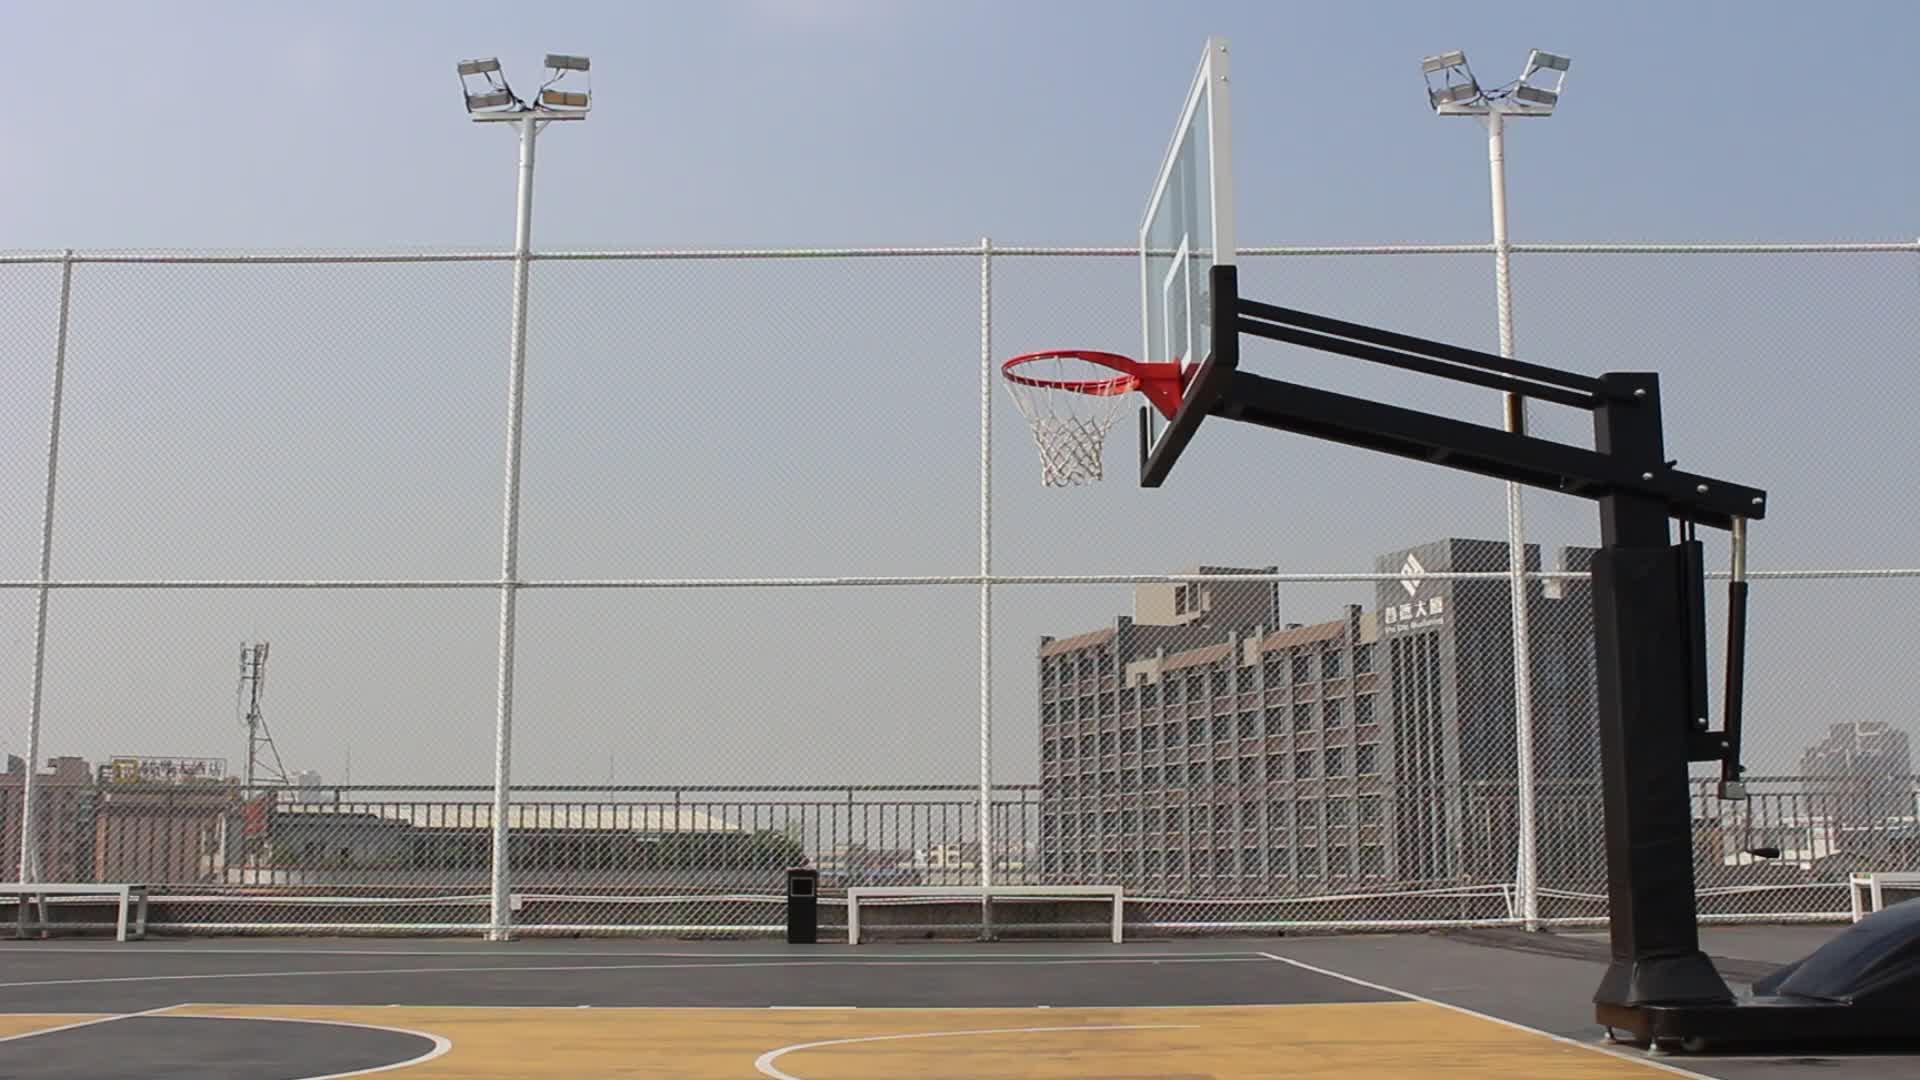 "Adjustable Portable Basketball Goal with 54"" Backboard and Rim"